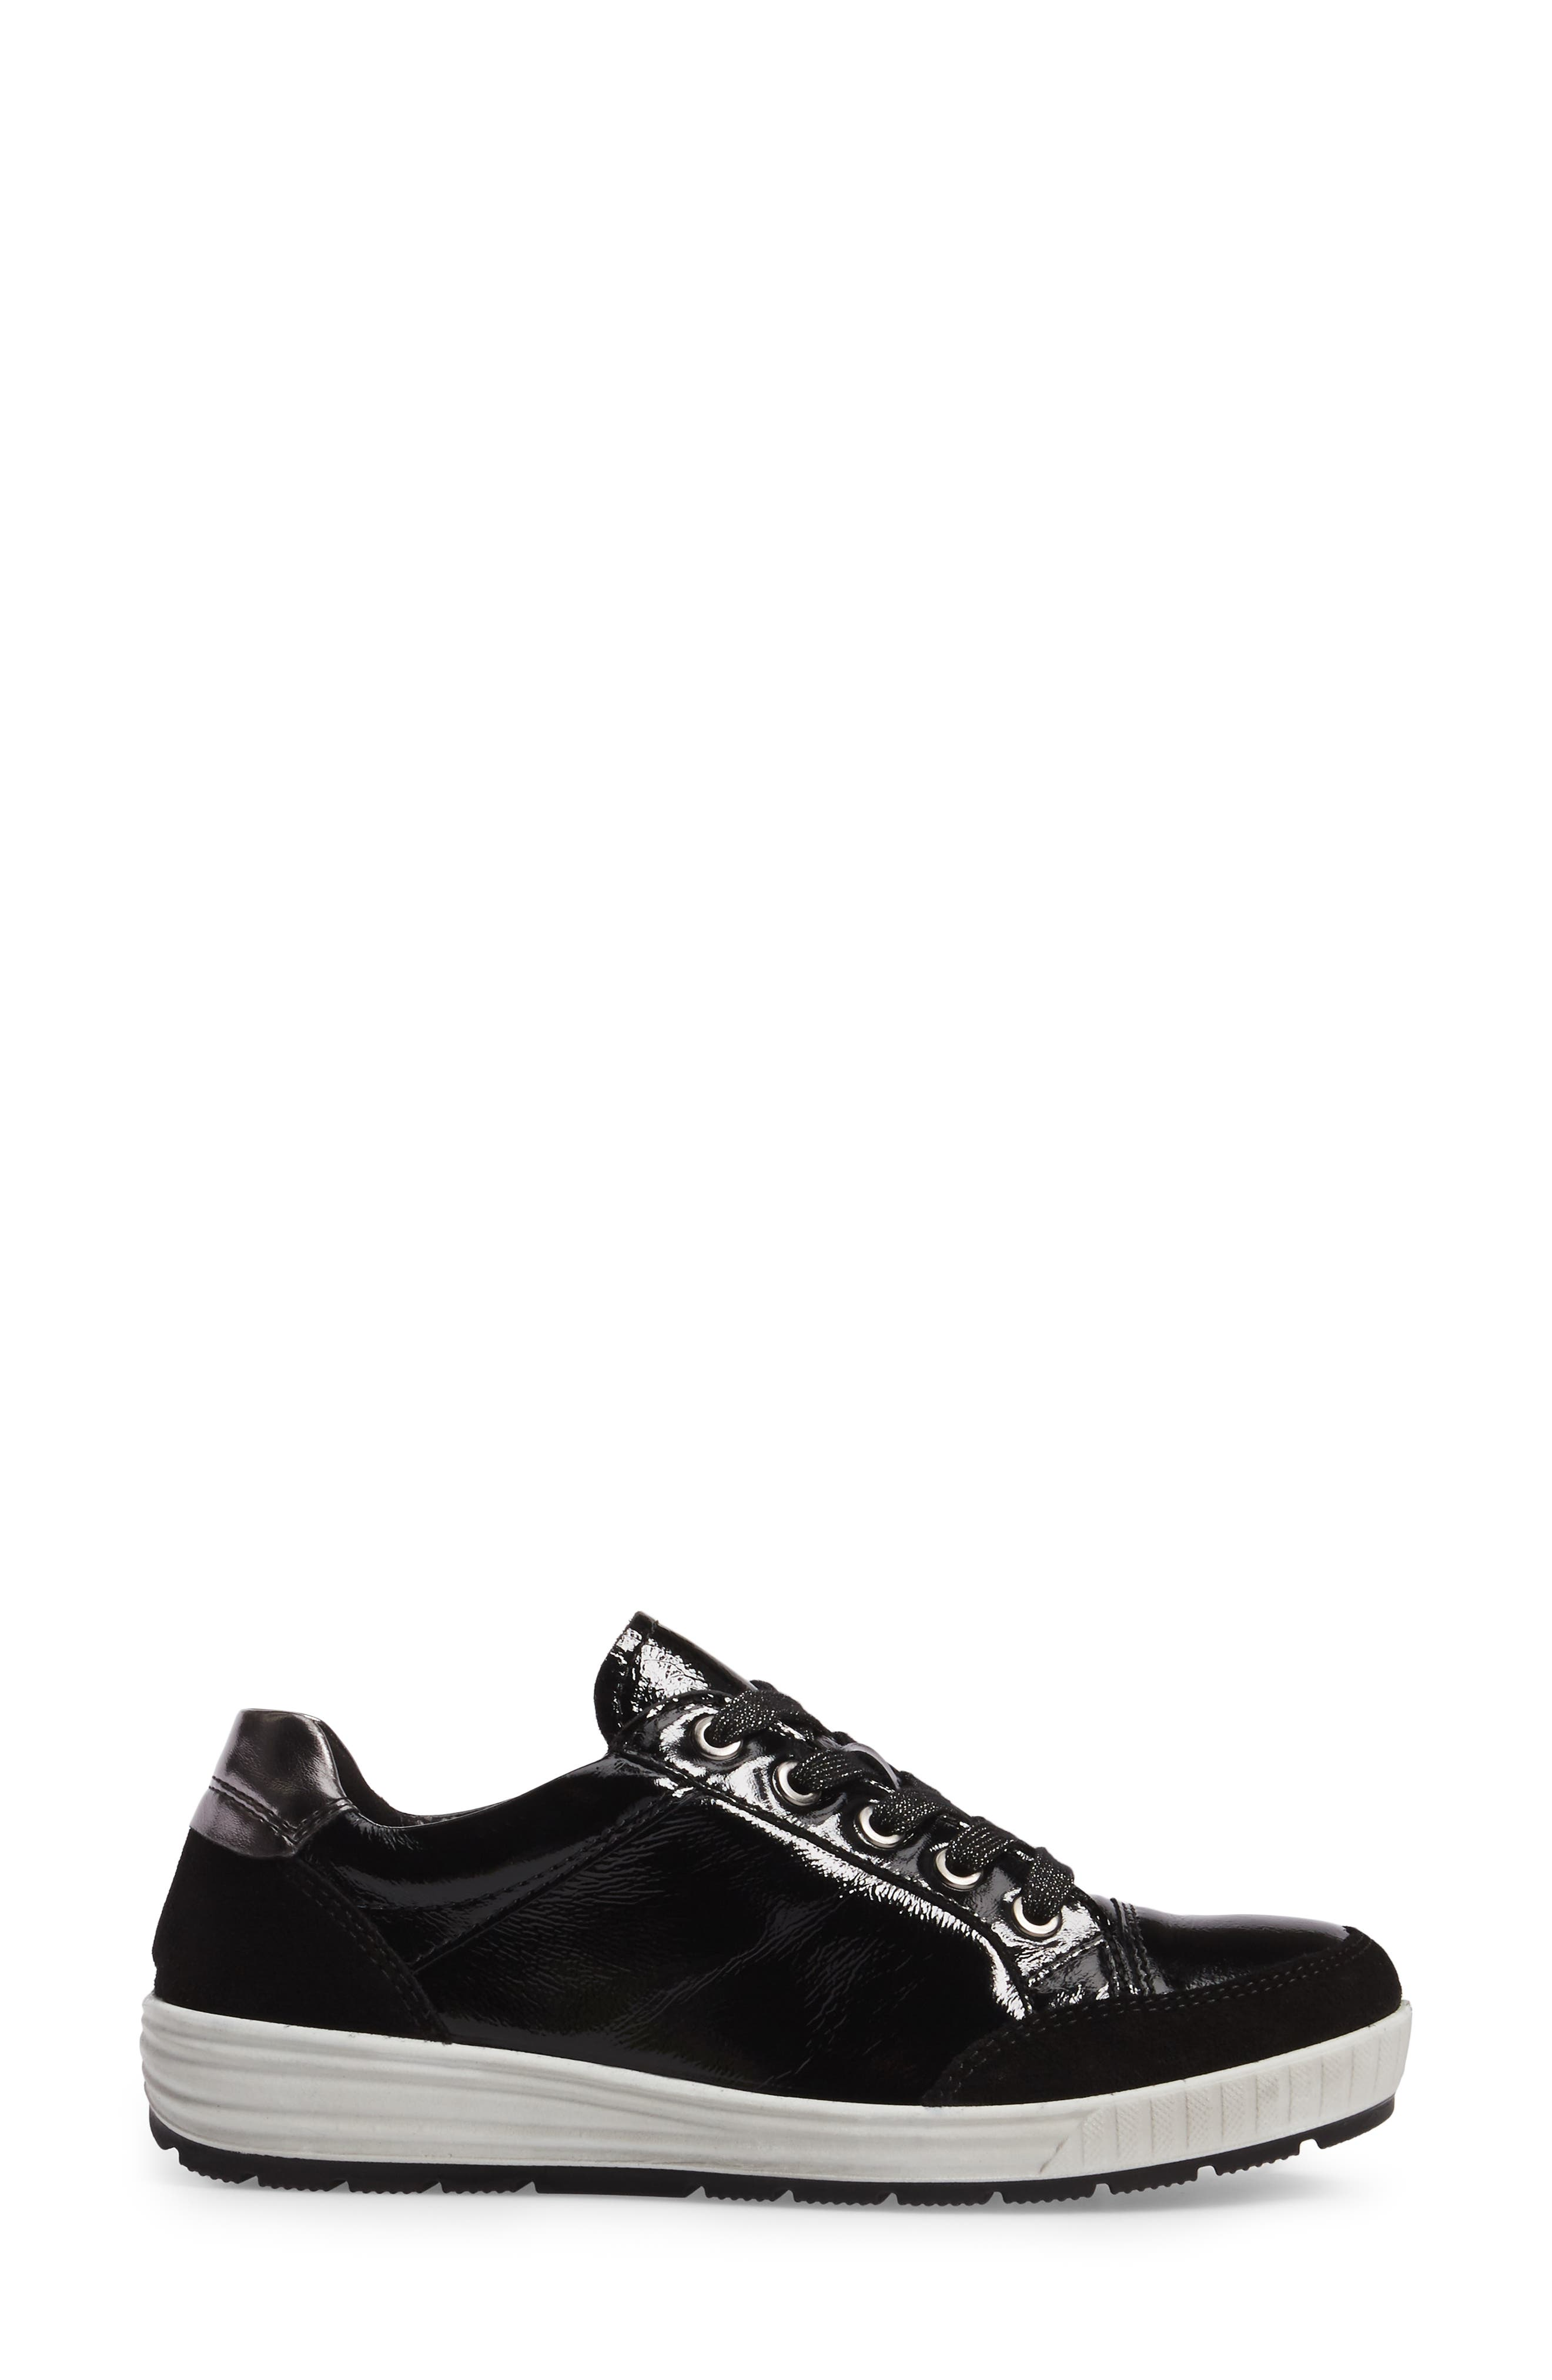 Nicole Sneaker,                             Alternate thumbnail 3, color,                             BLACK LEATHER